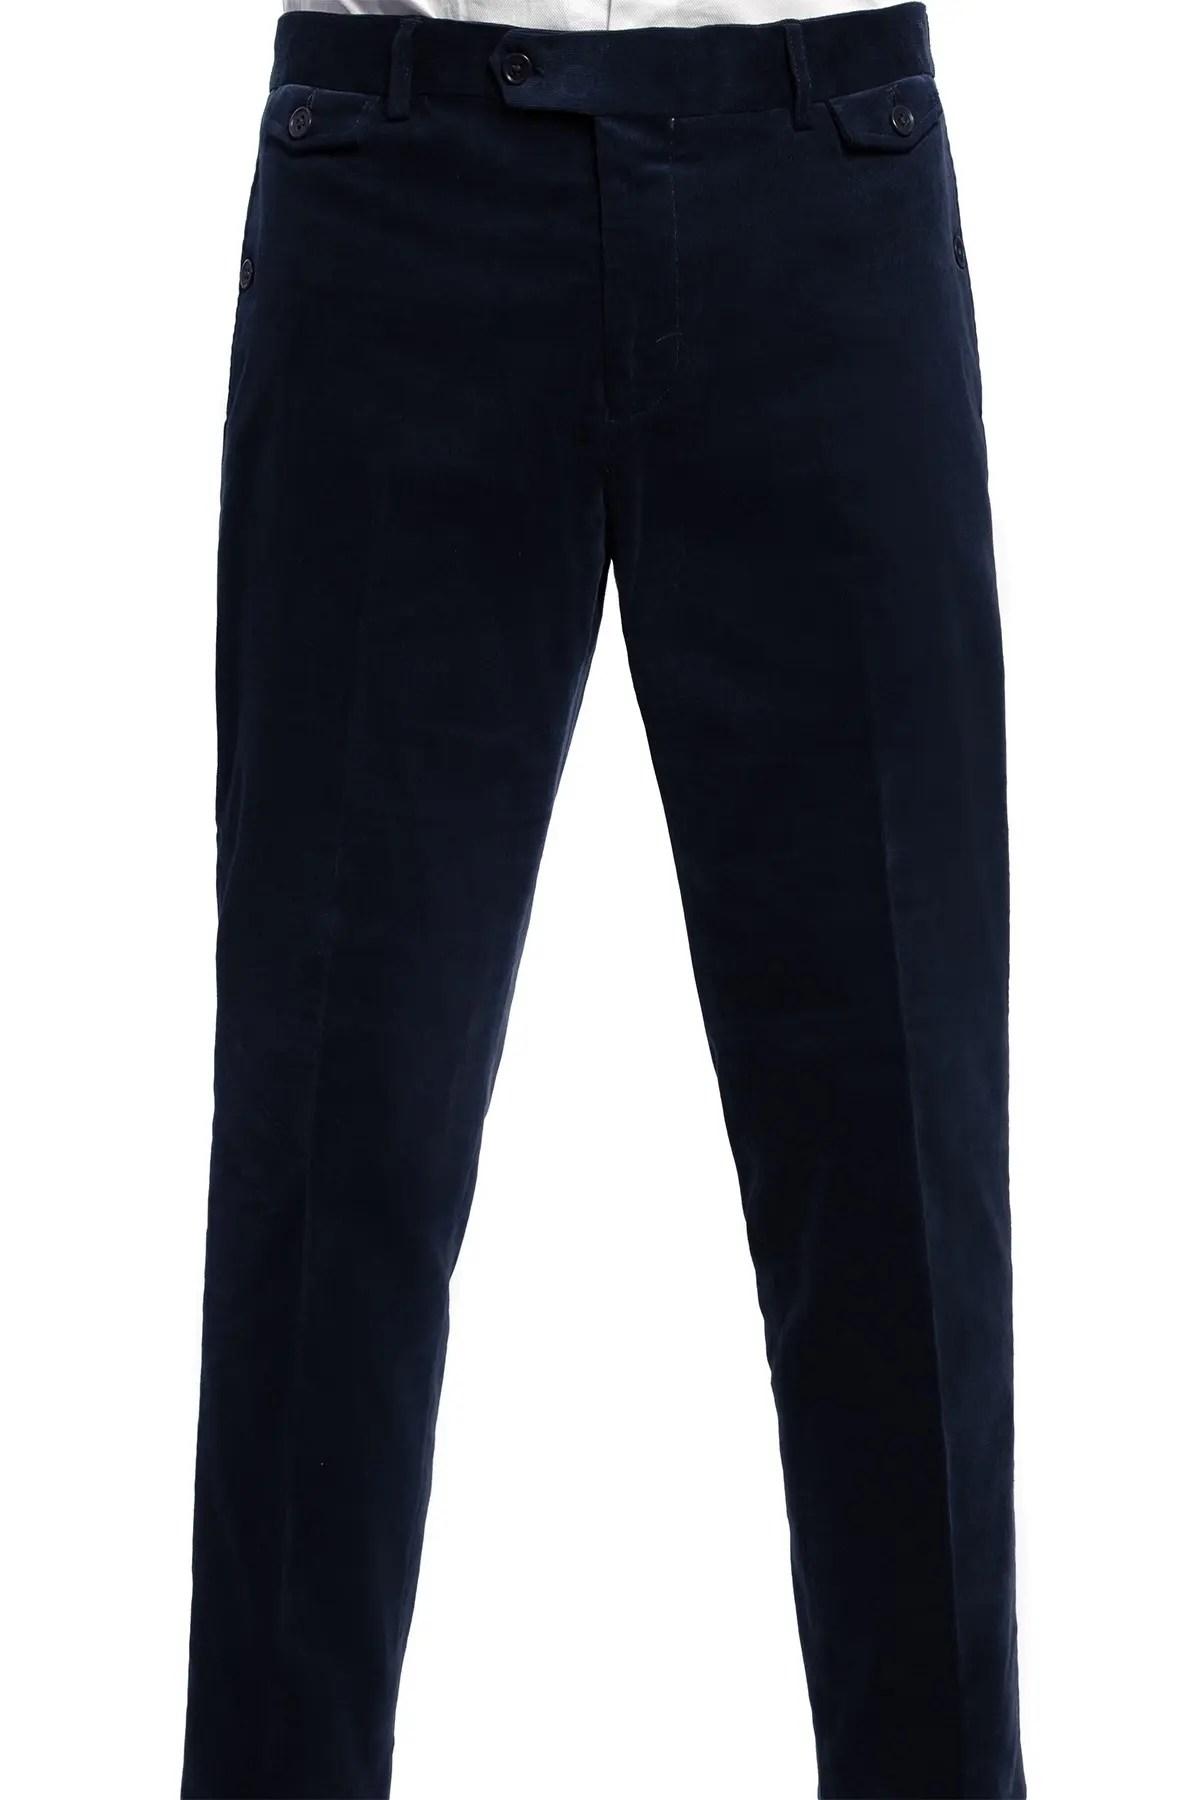 joe s jeans flat front slim fit corduroy pants nordstrom rack